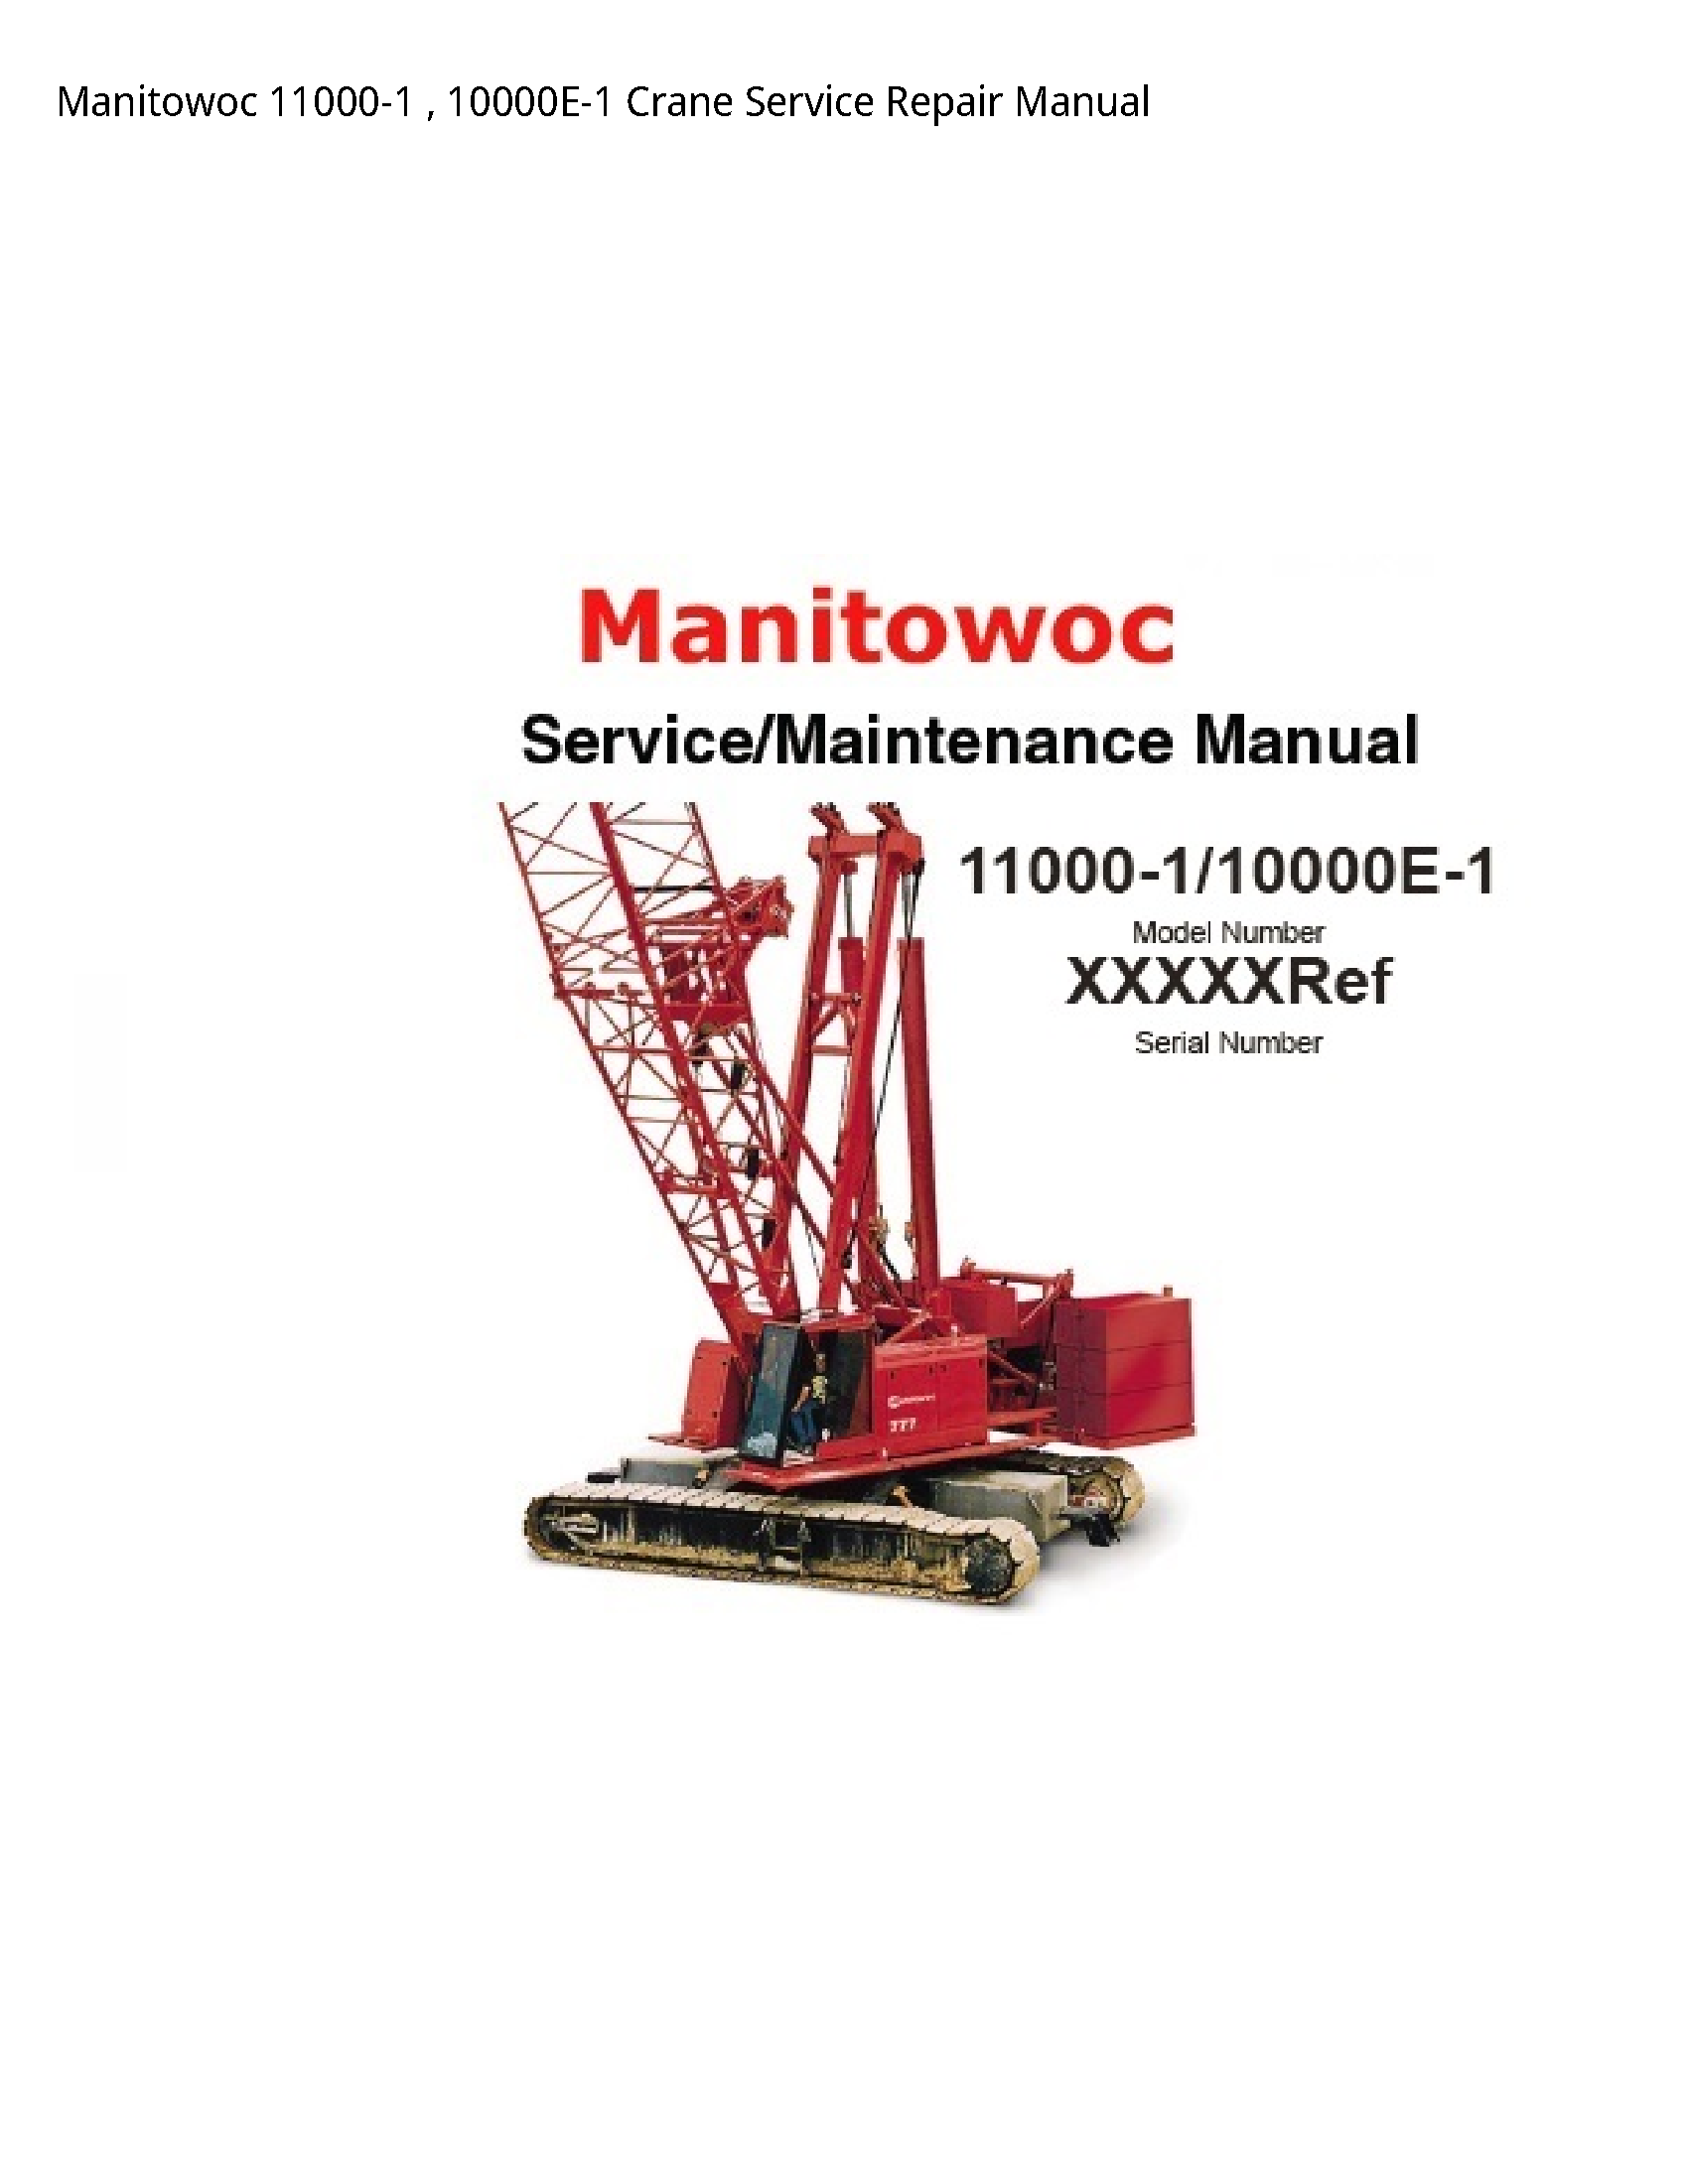 Manitowoc 11000-1 Crane manual